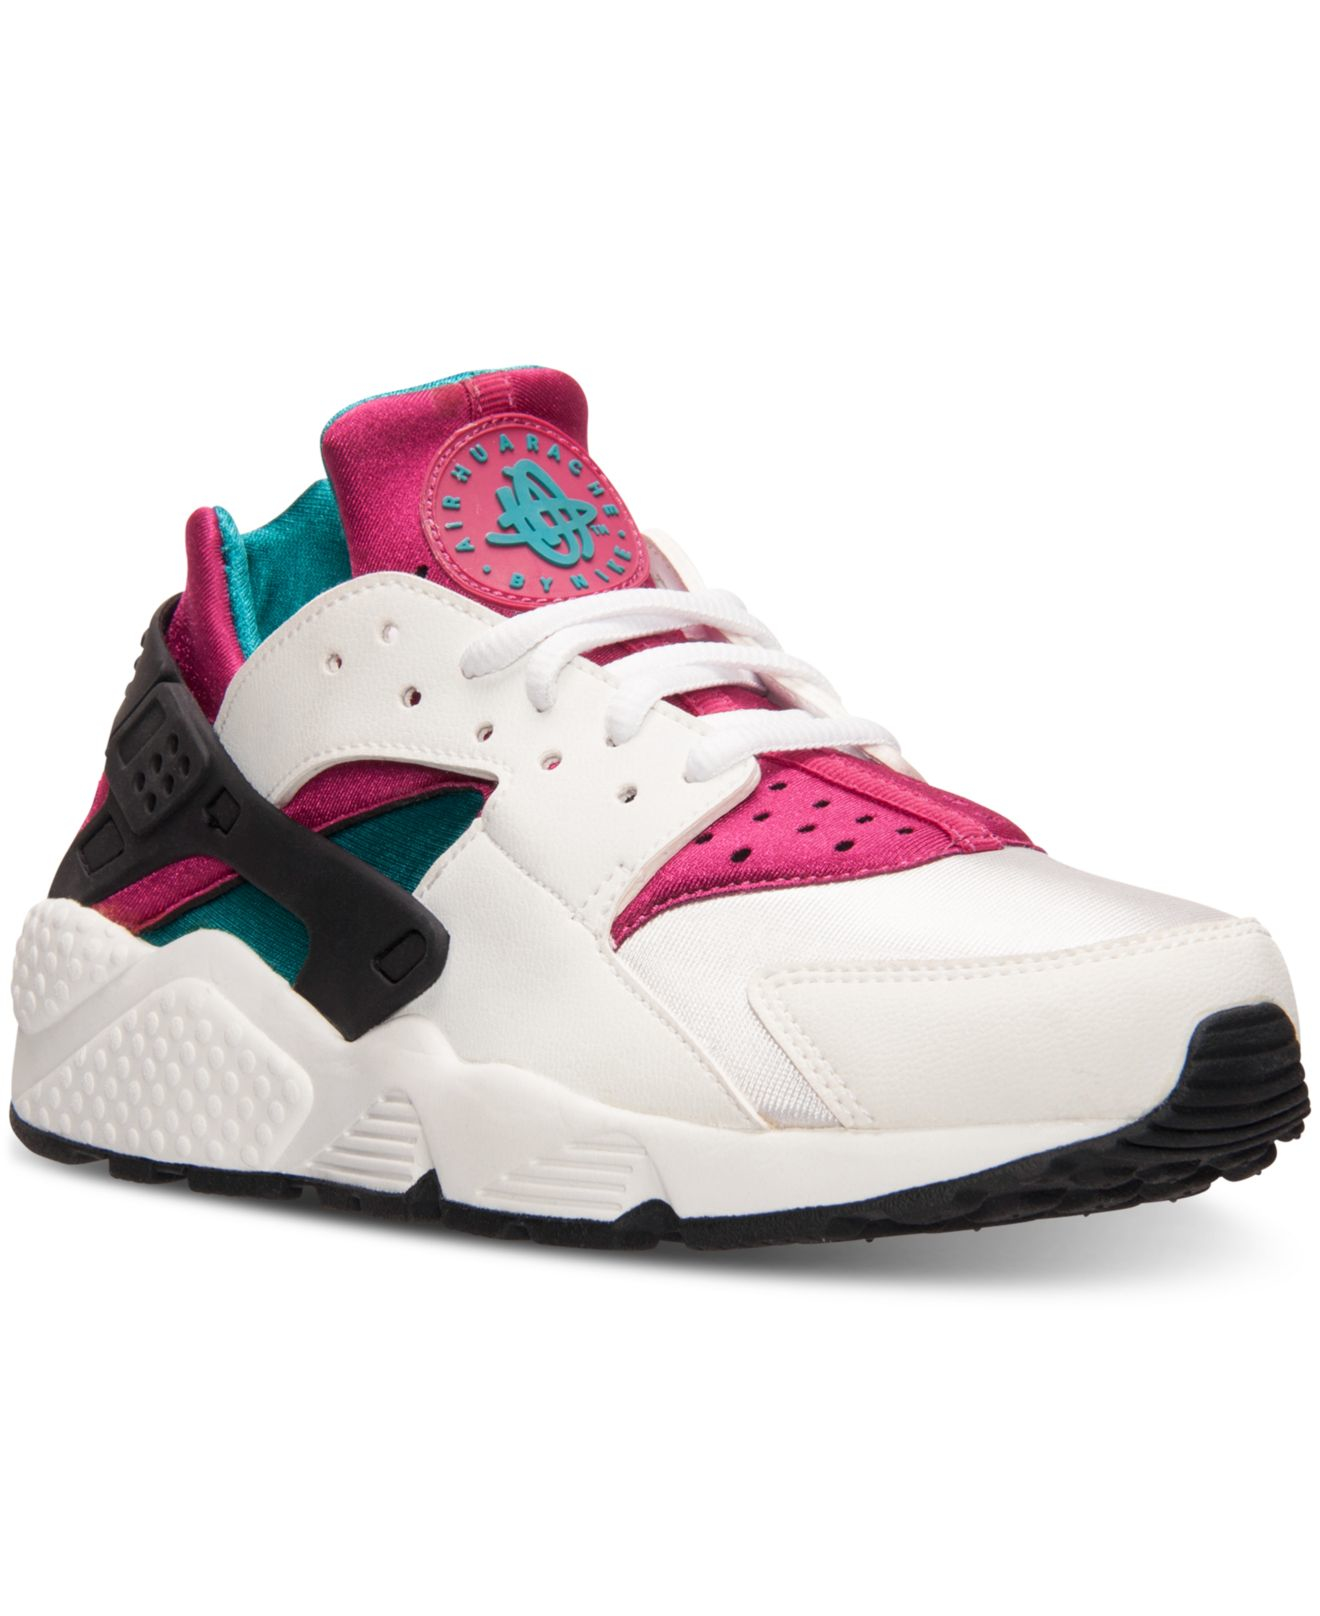 Lyst - Nike Women s Air Huarache Run Running Sneakers From Finish ... 0ef71afa42